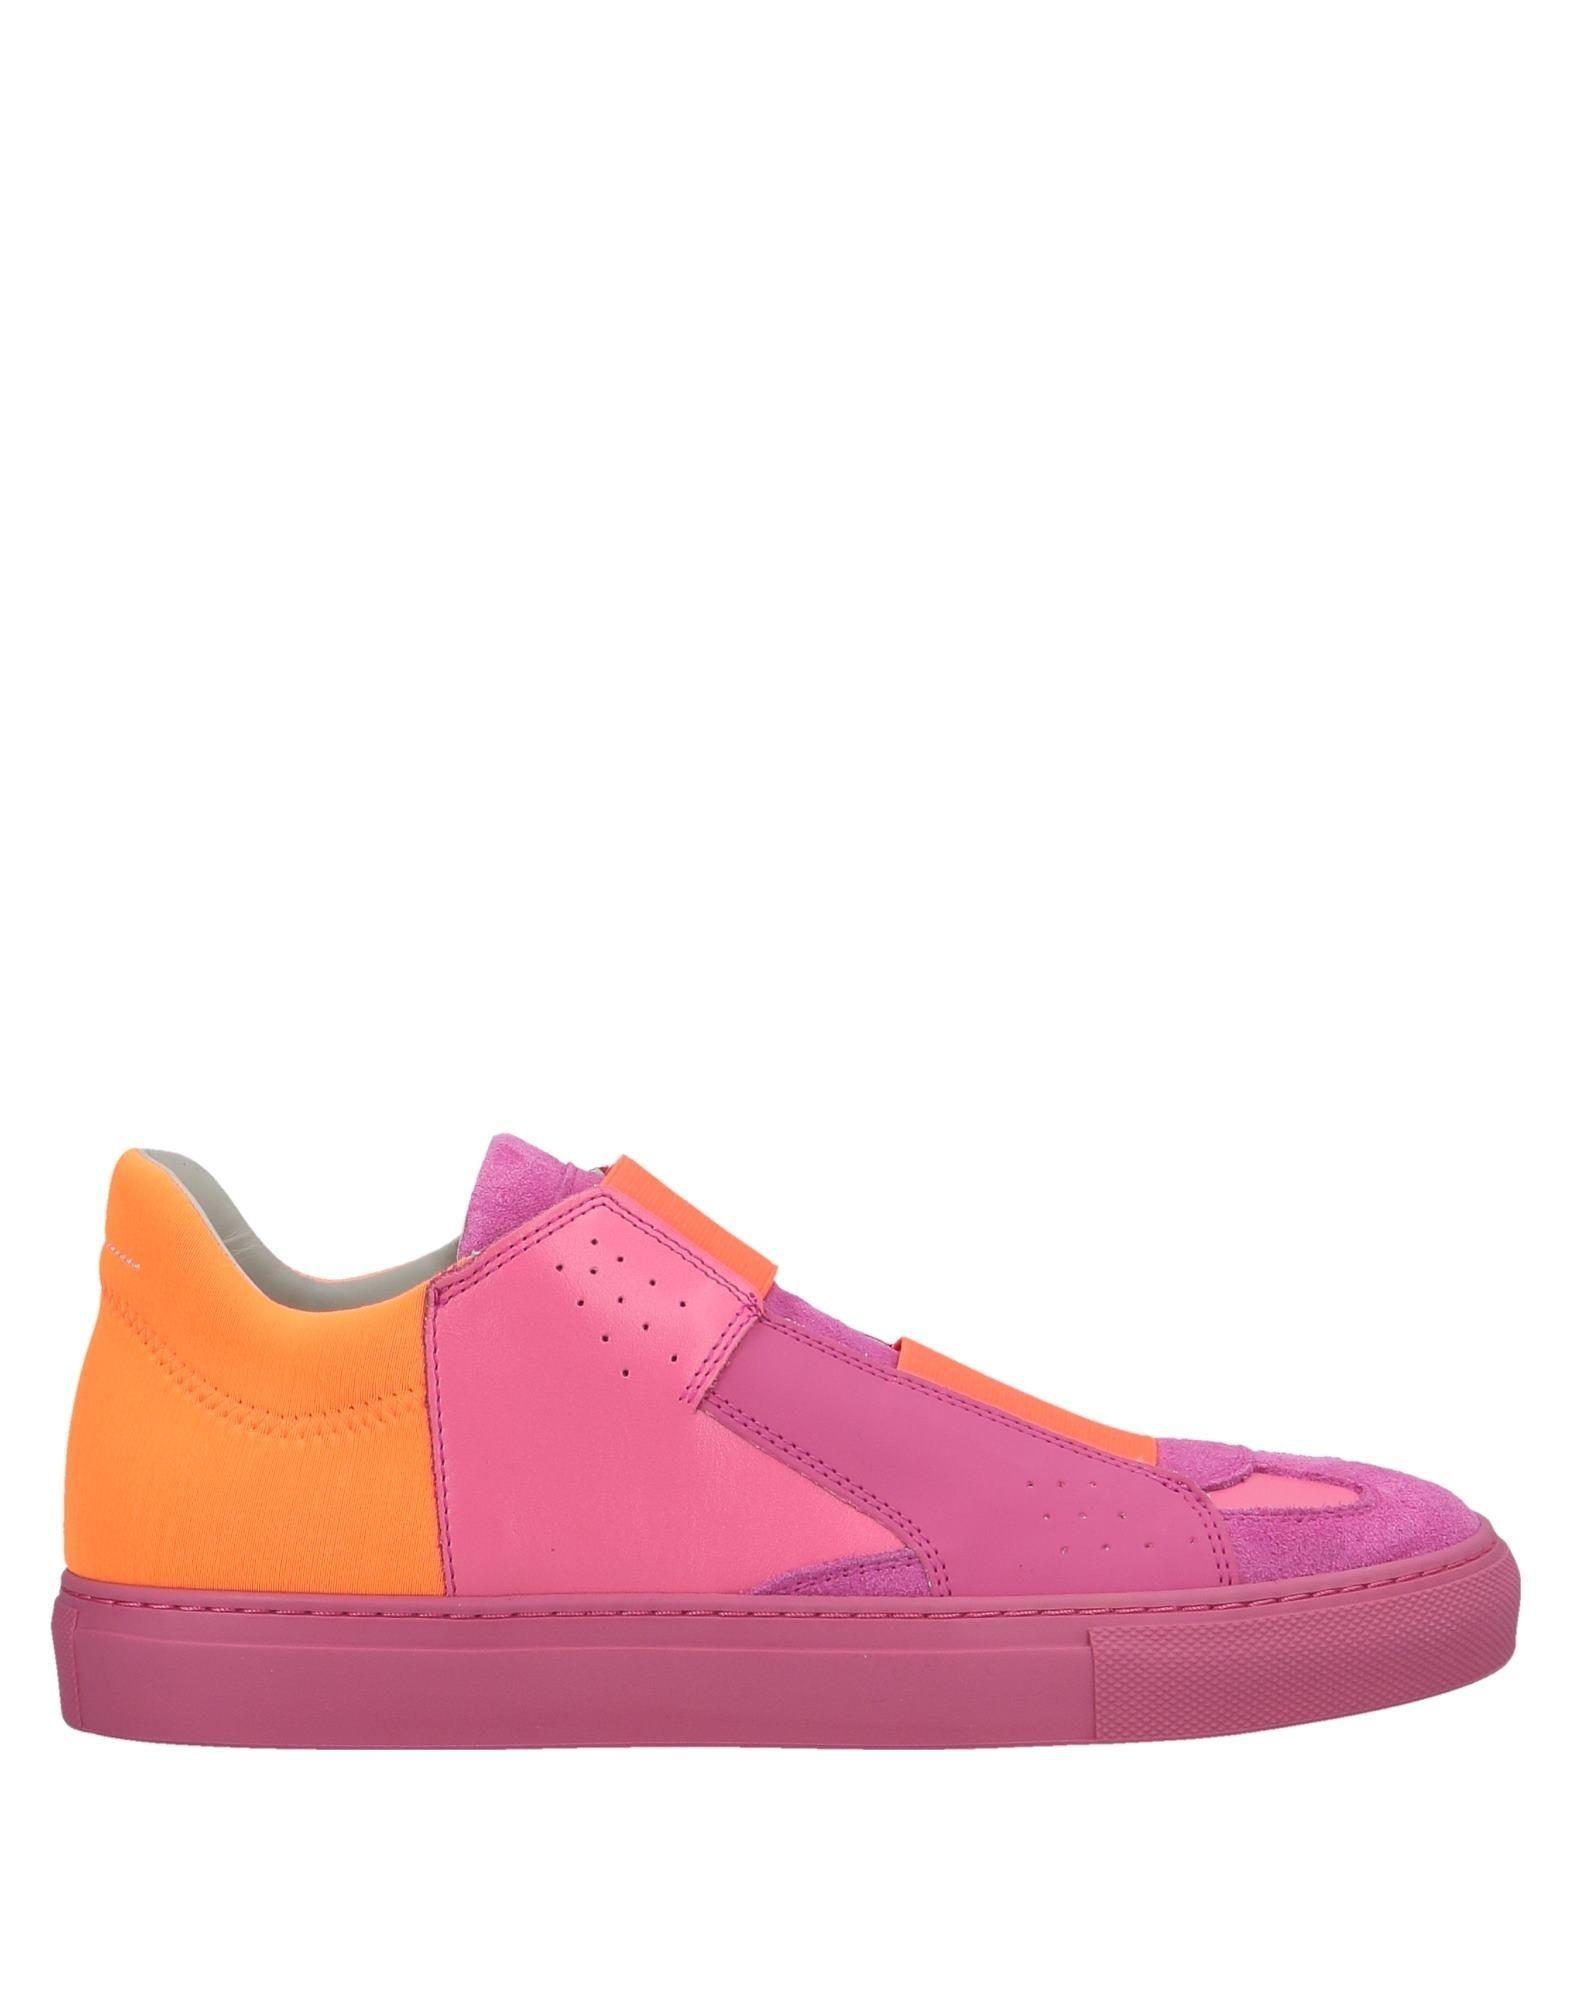 Mm6 Maison Mm6 Margiela Sneakers - Women Mm6 Maison Maison Margiela Sneakers online on  Australia - 11564648EQ cc2ca5